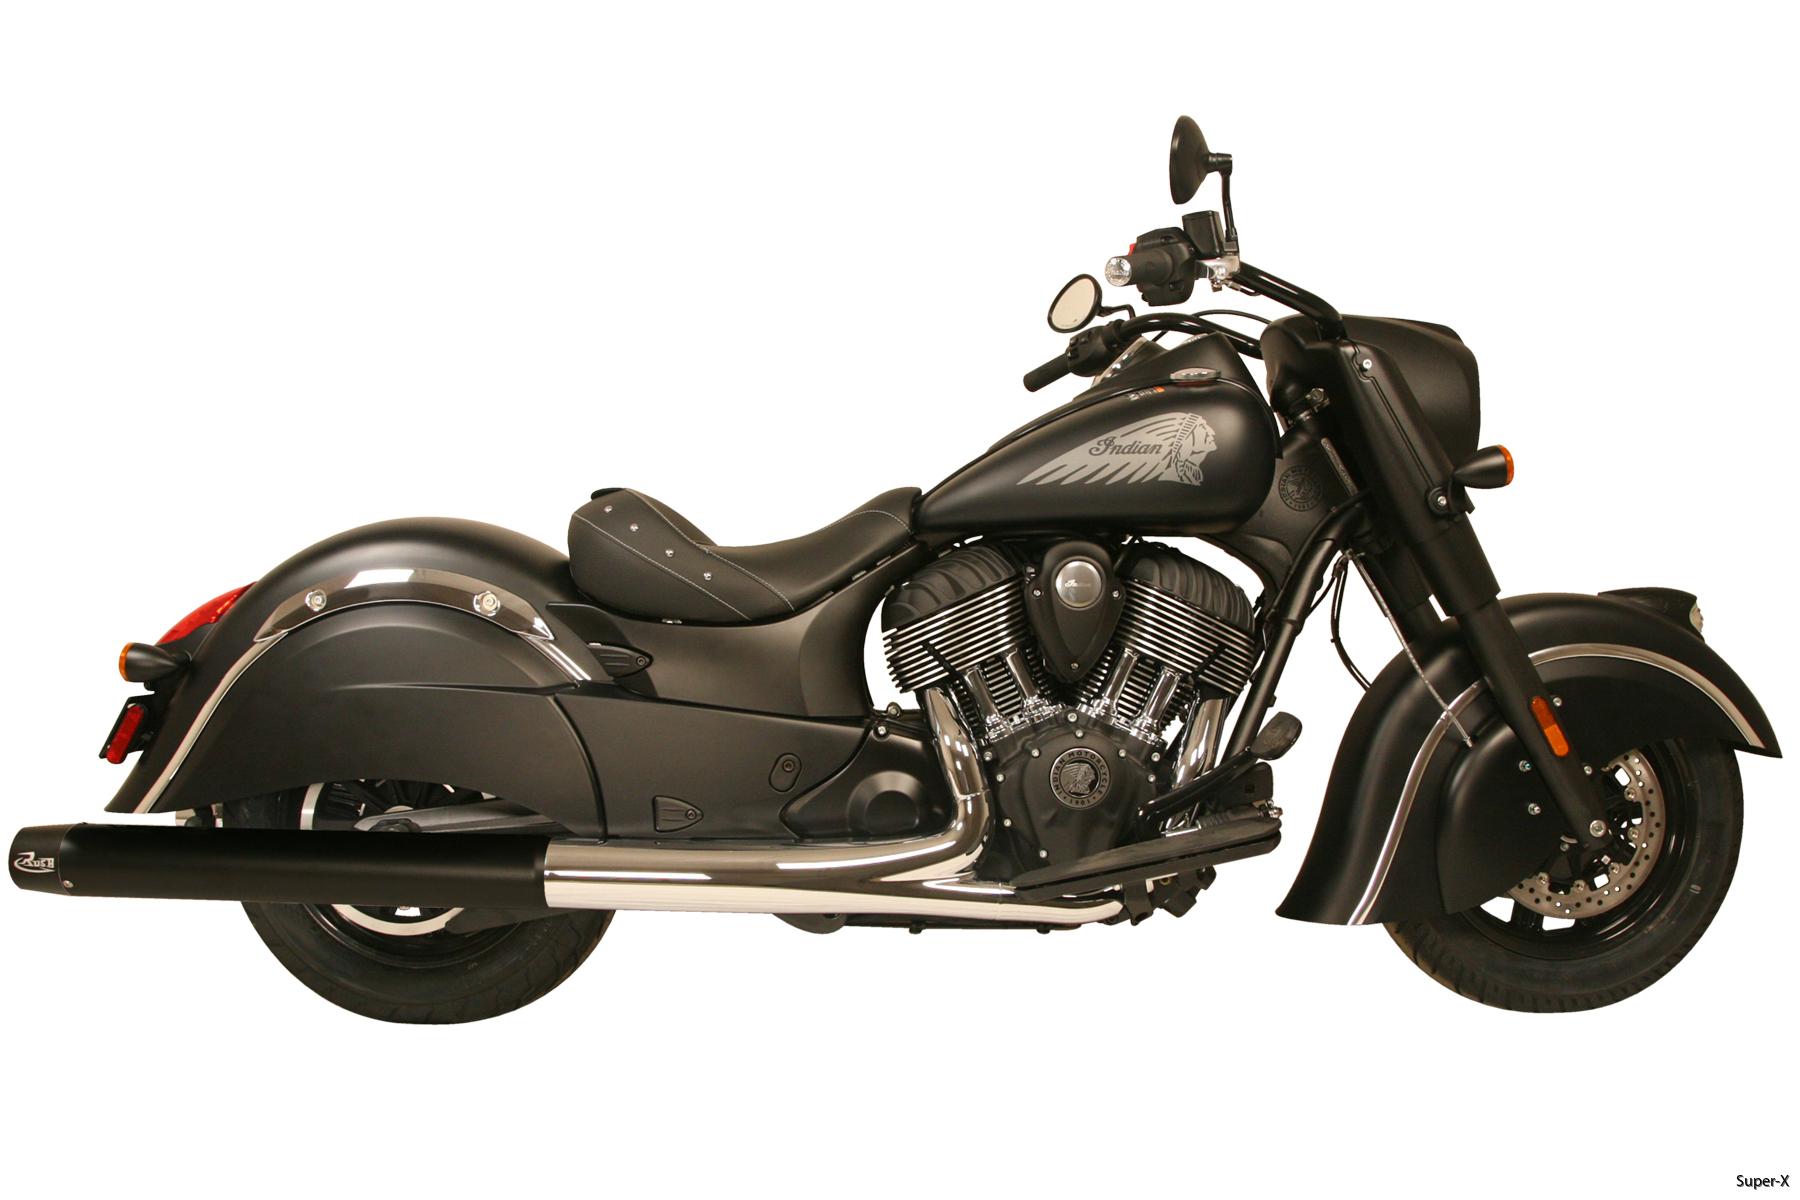 2015 Dark Horse black mufflers